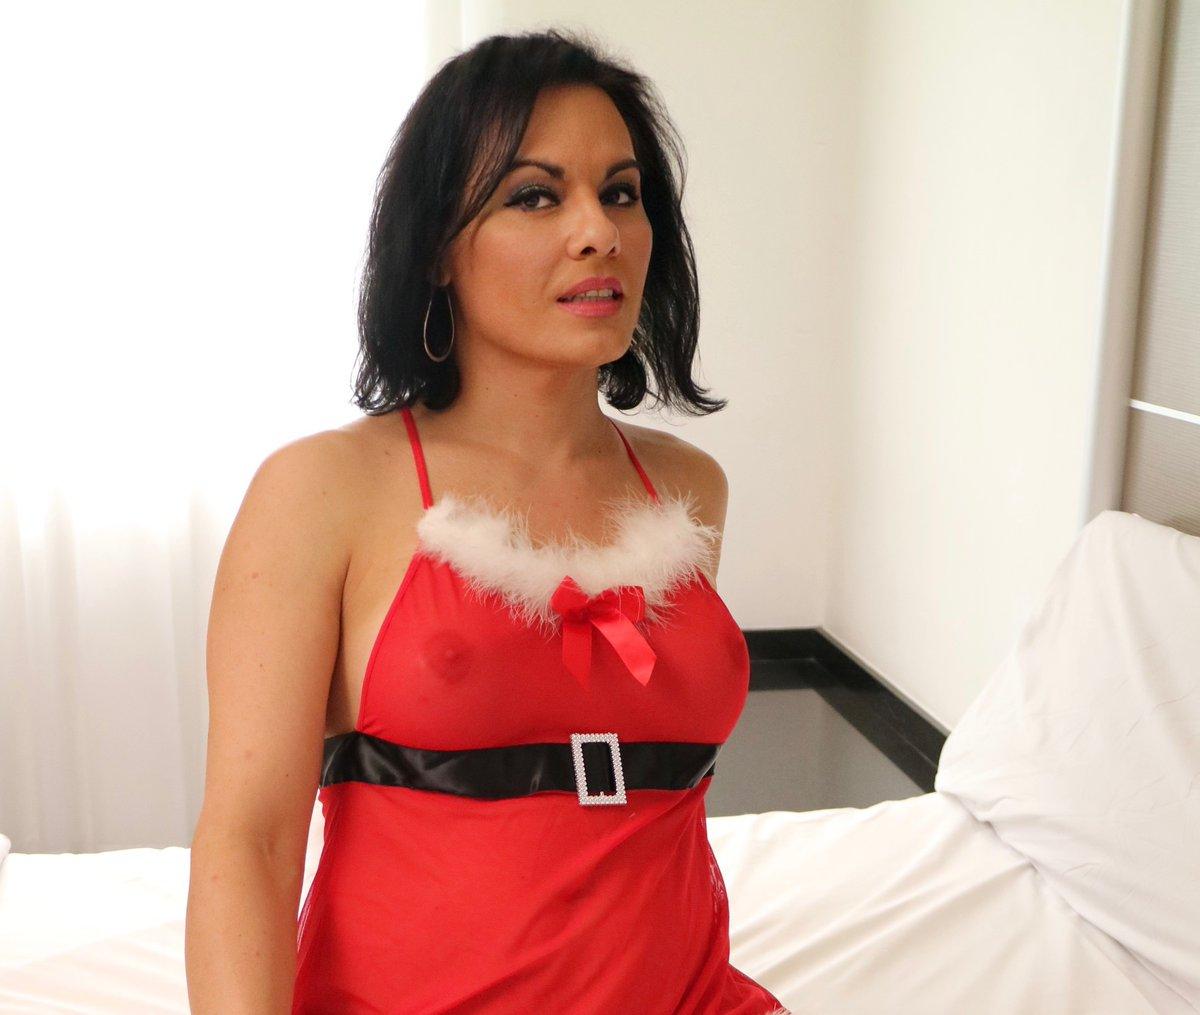 MonaVela VIP @monavelavip  Hi! I'm #MonaVela, porn #trans model and producer in México City. Details DM. ¡Hola! soy Mona Vela, modelo y productora Porno trans en CDMX, detalles por MD. RT & FOLLOW @monavelavip